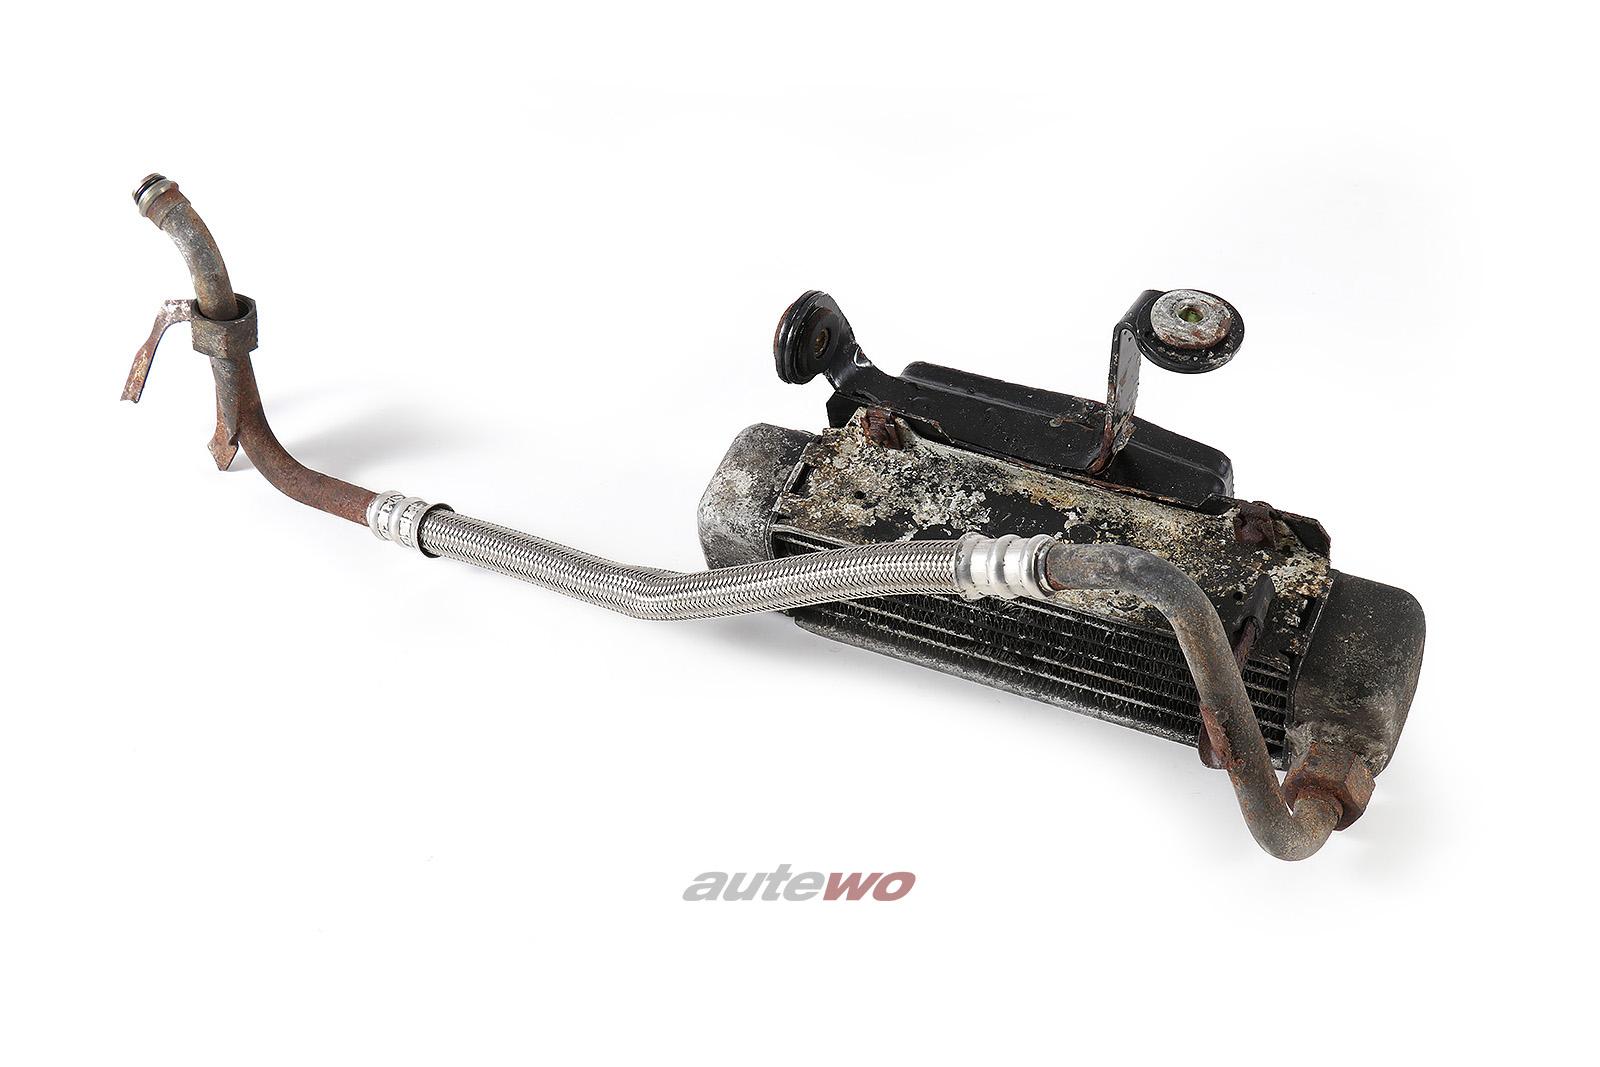 034117021 034117021B/4A0117123A Audi S4/S6 C4 2.2l Motor-Ölkühler